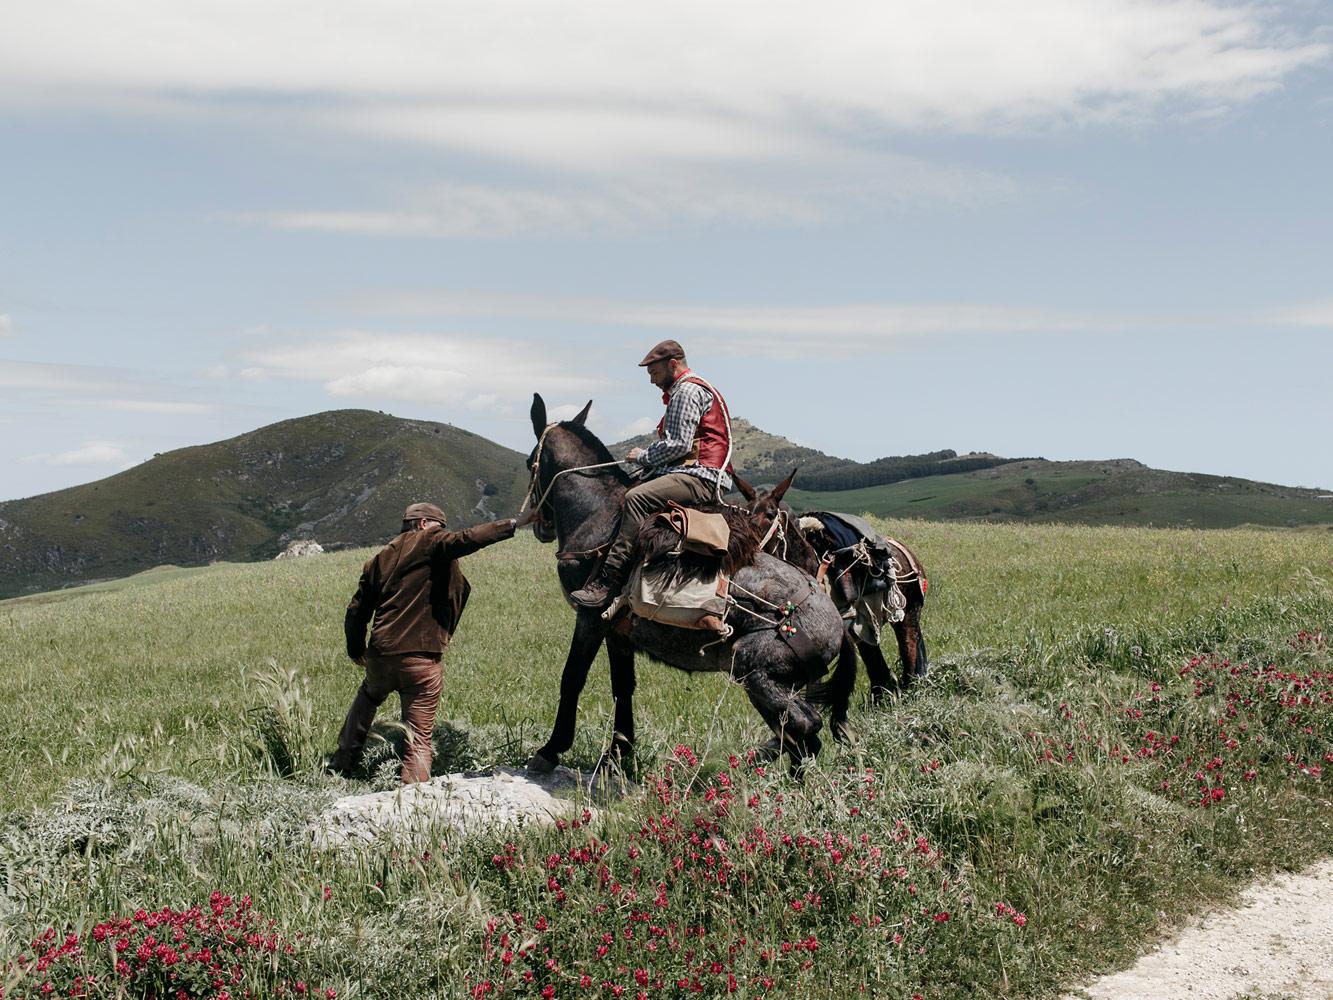 Deep Land, © Roselena Giovanna Ramistella, 1st Place, Natural World & Wildlife : Professional, Sony World Photography Awards